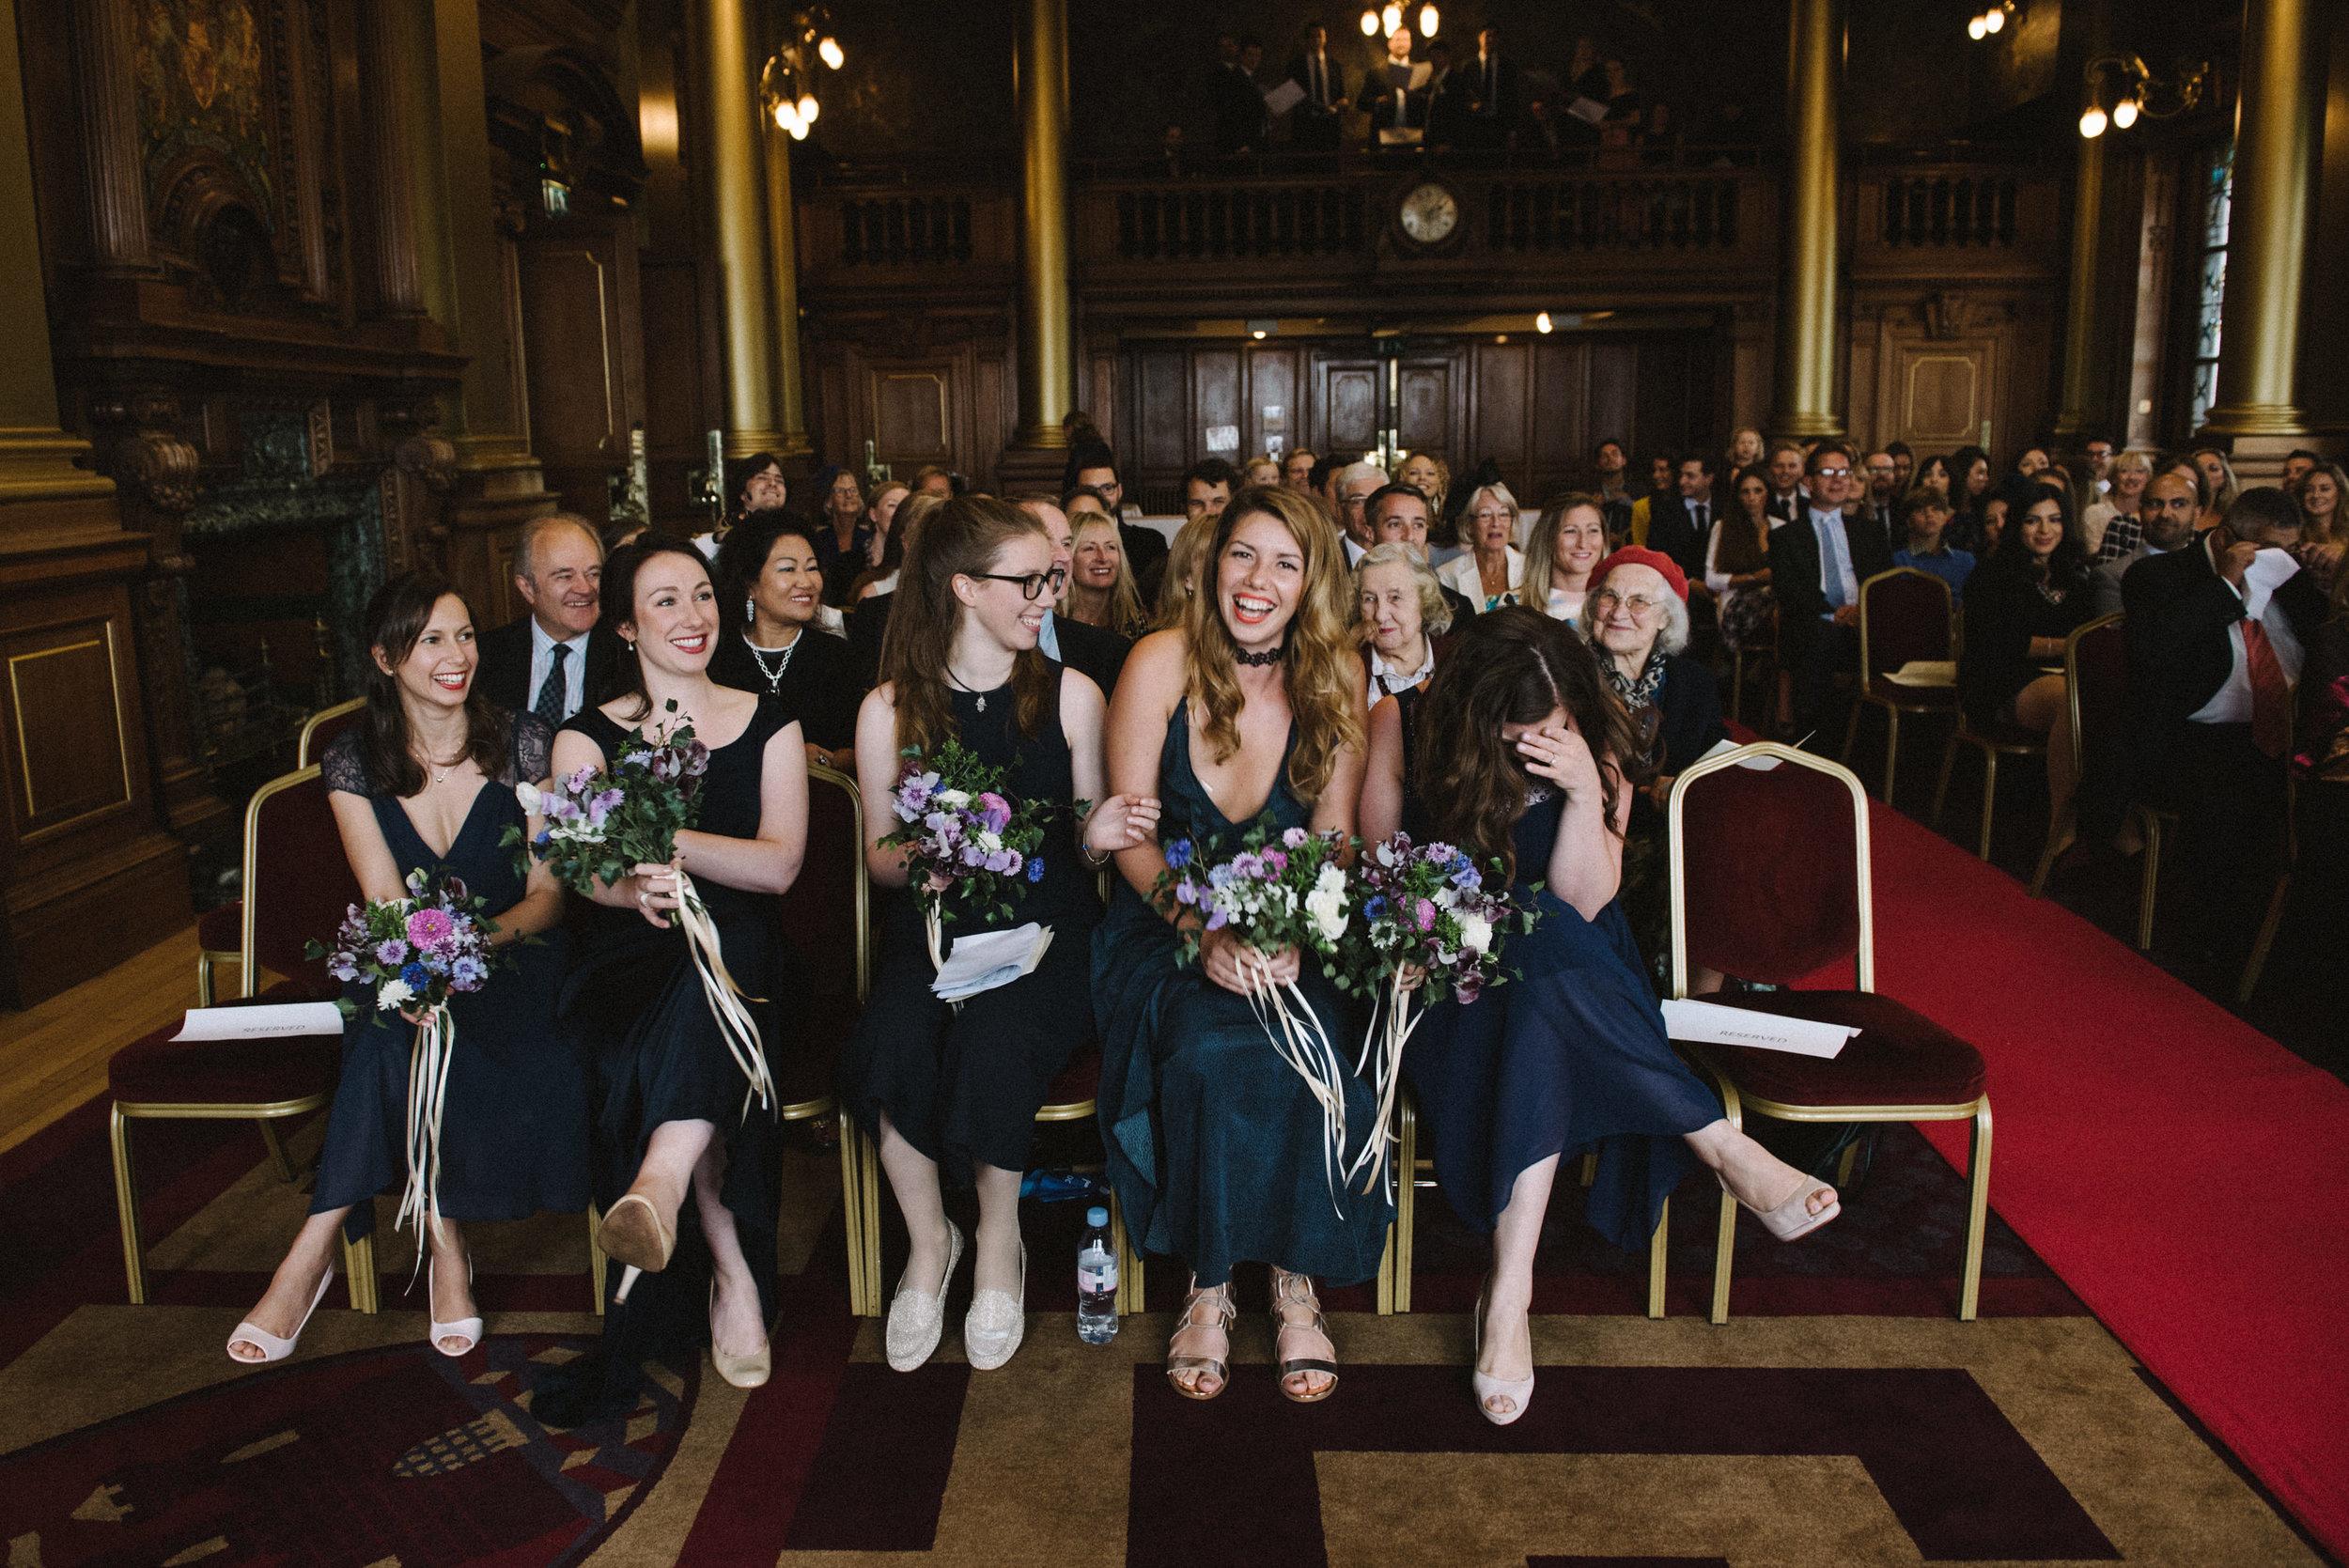 0195-LISA-DEVINE-PHOTOGRAPHY-ALTERNATIVE-WEDDING-PHOTOGRAPHY-SCOTLAND-DESTINATION-WEDDINGS-GLASGOW-WEDDINGS-COOL-WEDDINGS-STYLISH-WEDDINGS.JPG